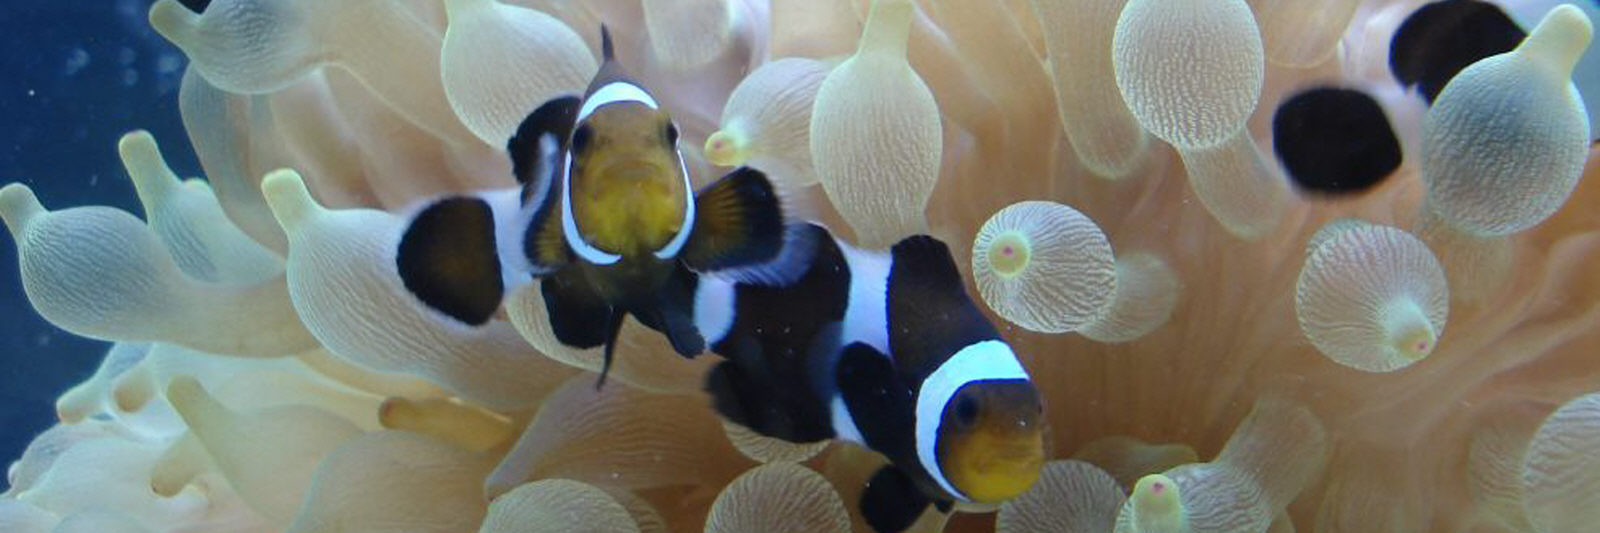 aquaristik in der nähe